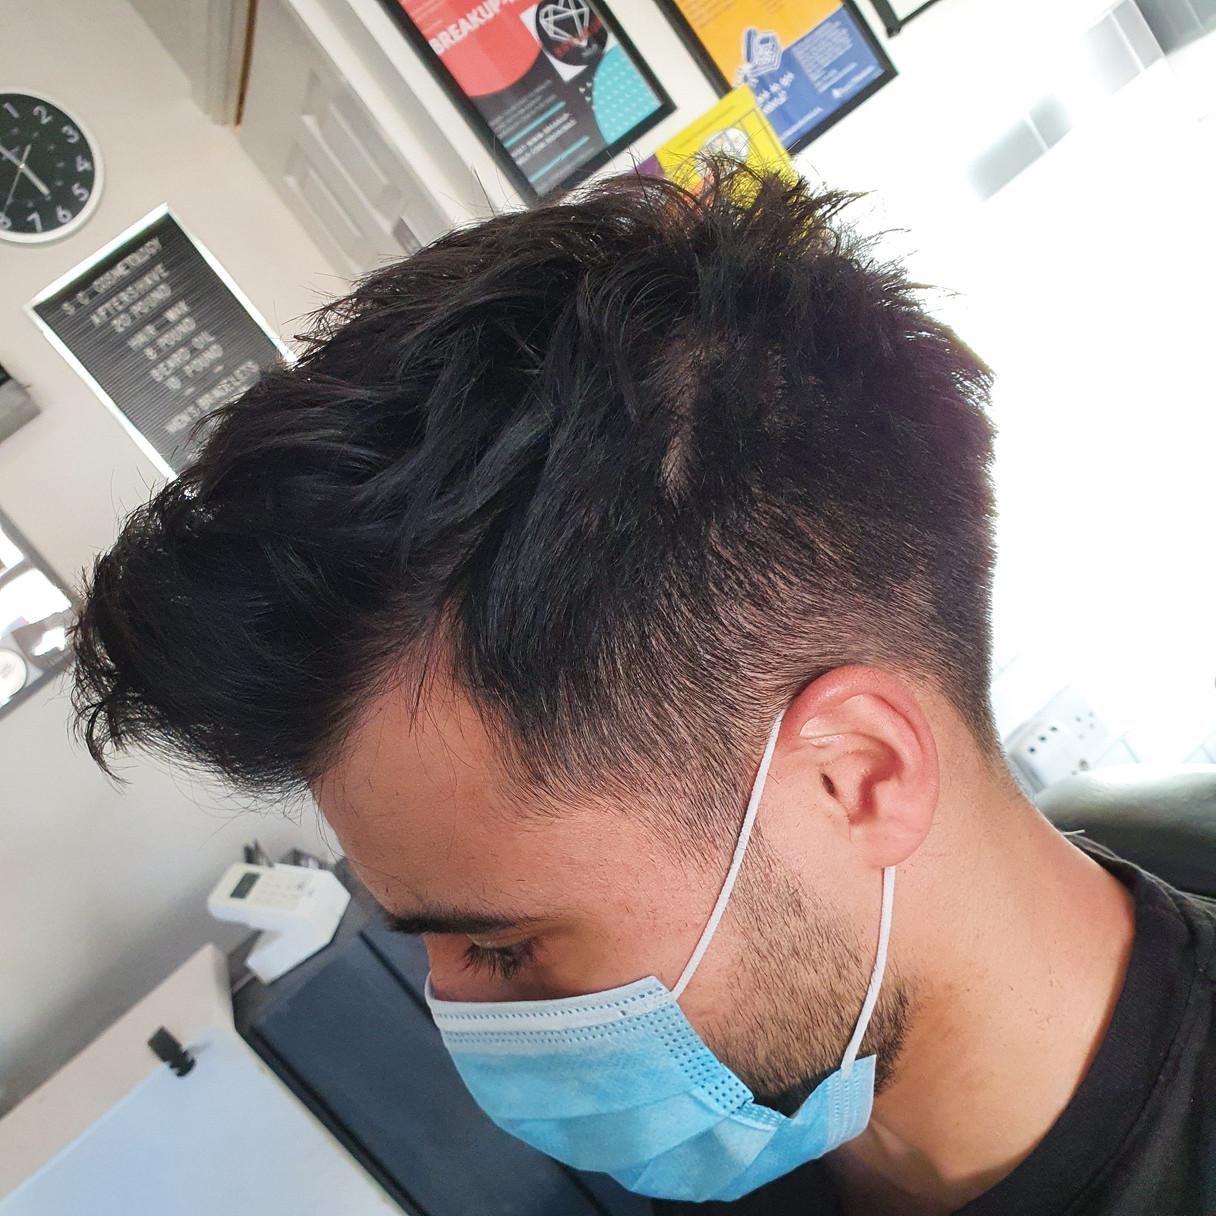 scissor cut to grade 1 and texured razor cut